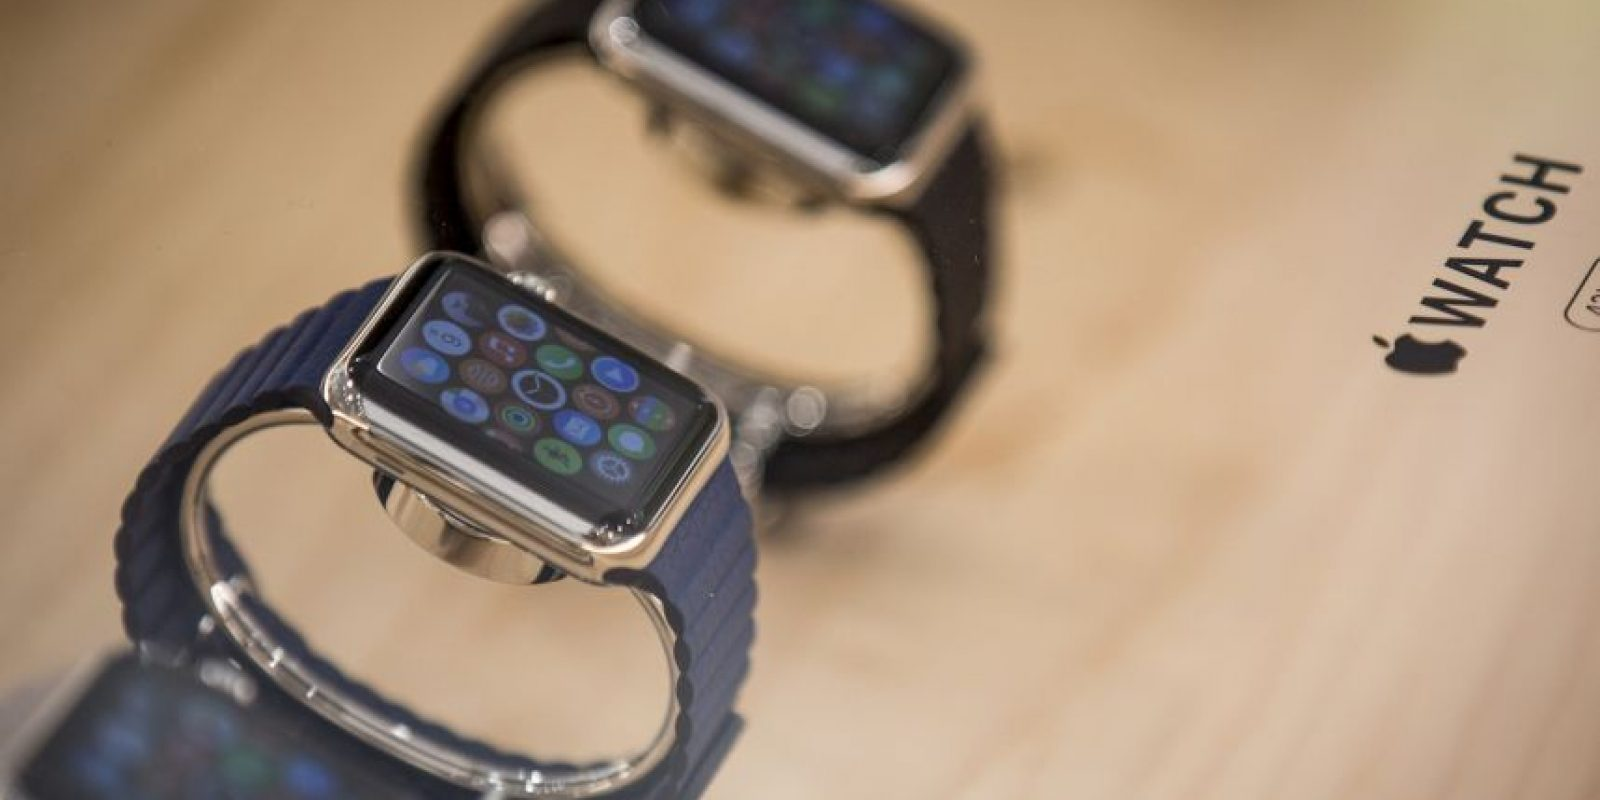 Pero Apple mantendrá ambas modalidades hasta nuevo aviso. Foto:Getty Images